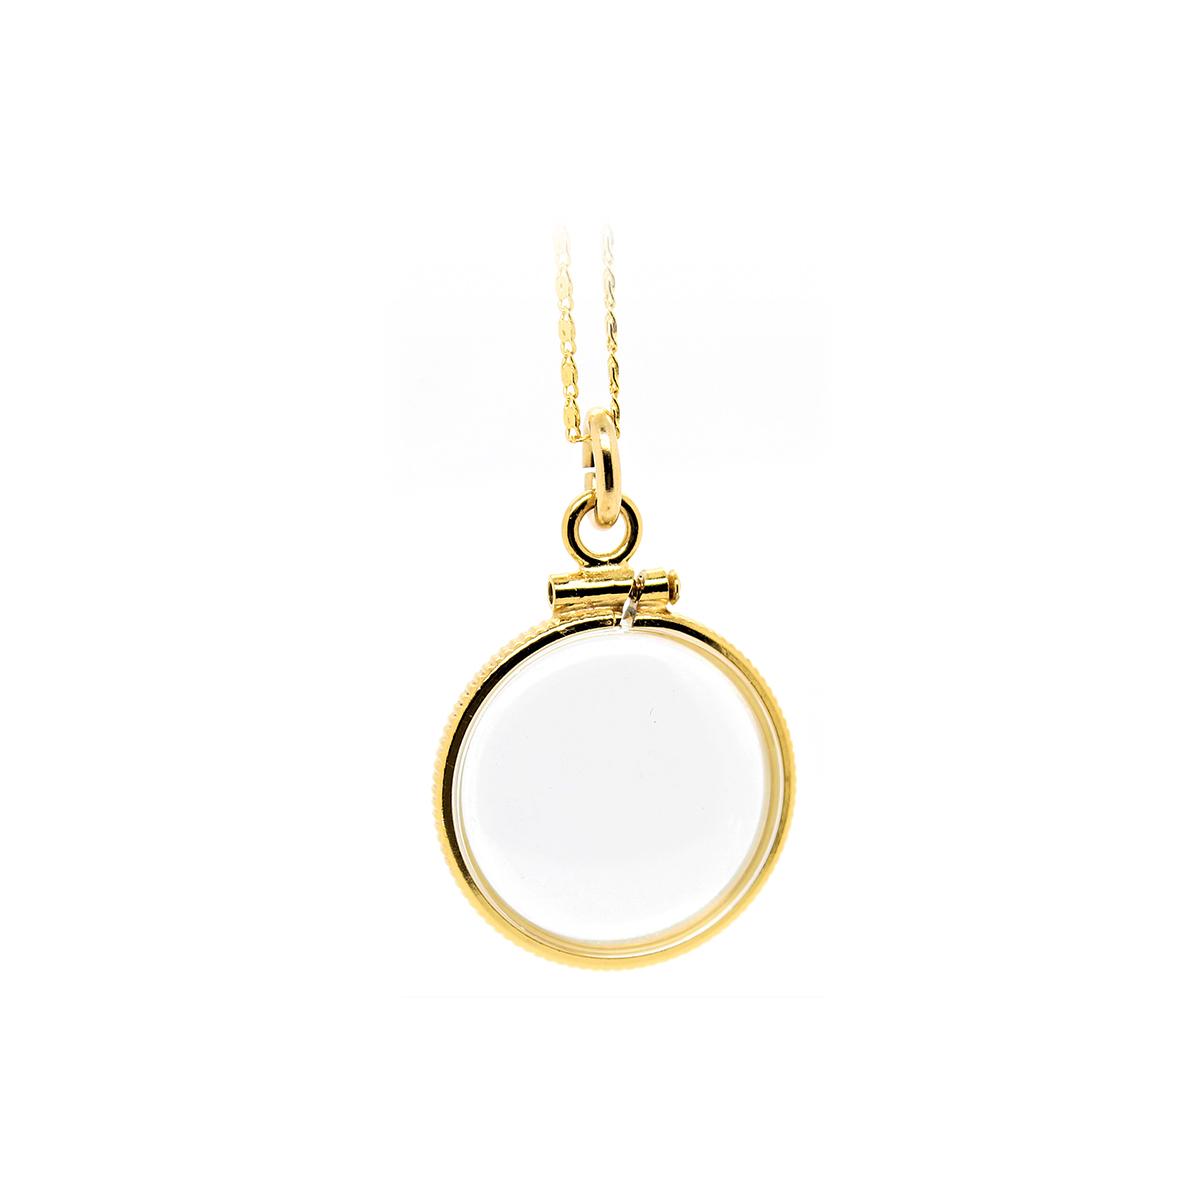 Vintage 14 Karat Yellow Gold Encased Acrylic Pendant Necklace